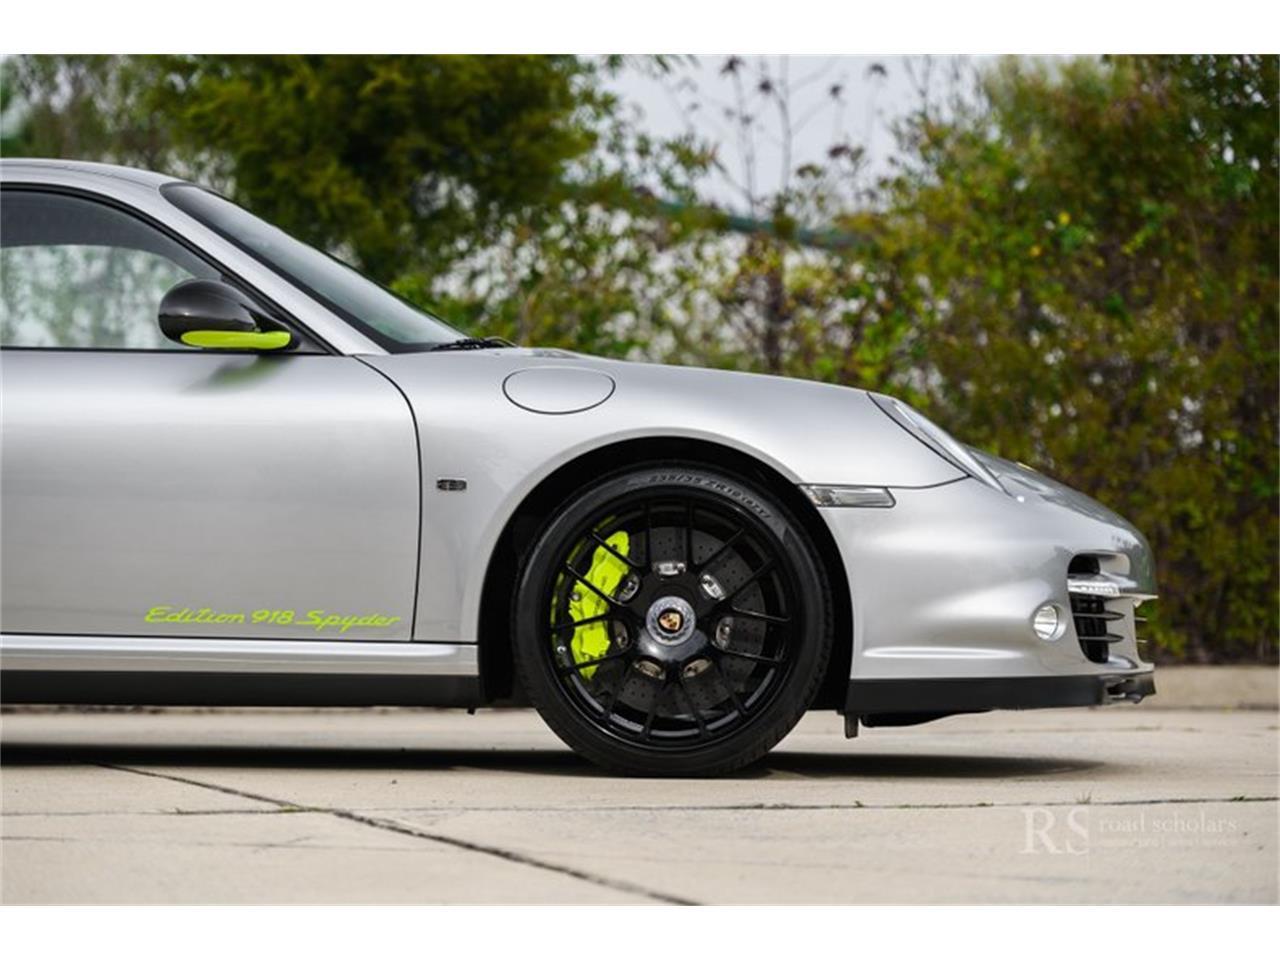 2012 Porsche 911 For Sale Classiccarscom Cc 1298107